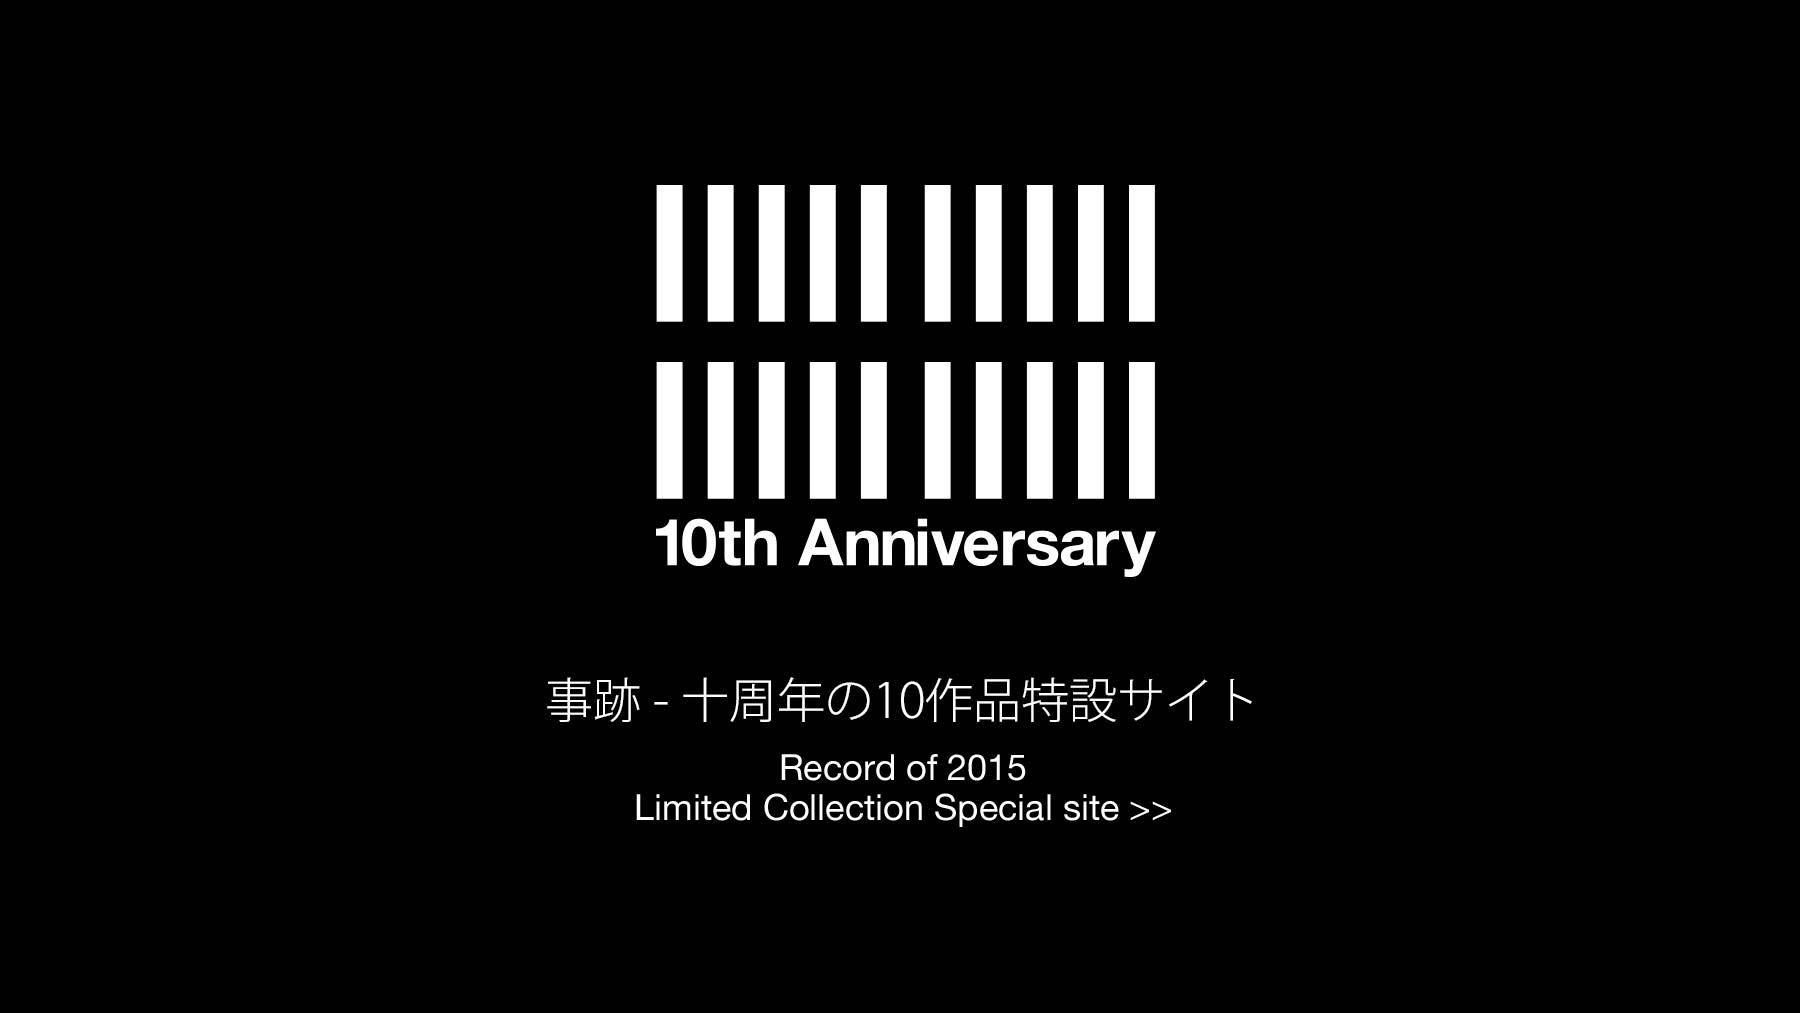 [PHOTO:Shizukuya 10th Anniversary Limited Collection]